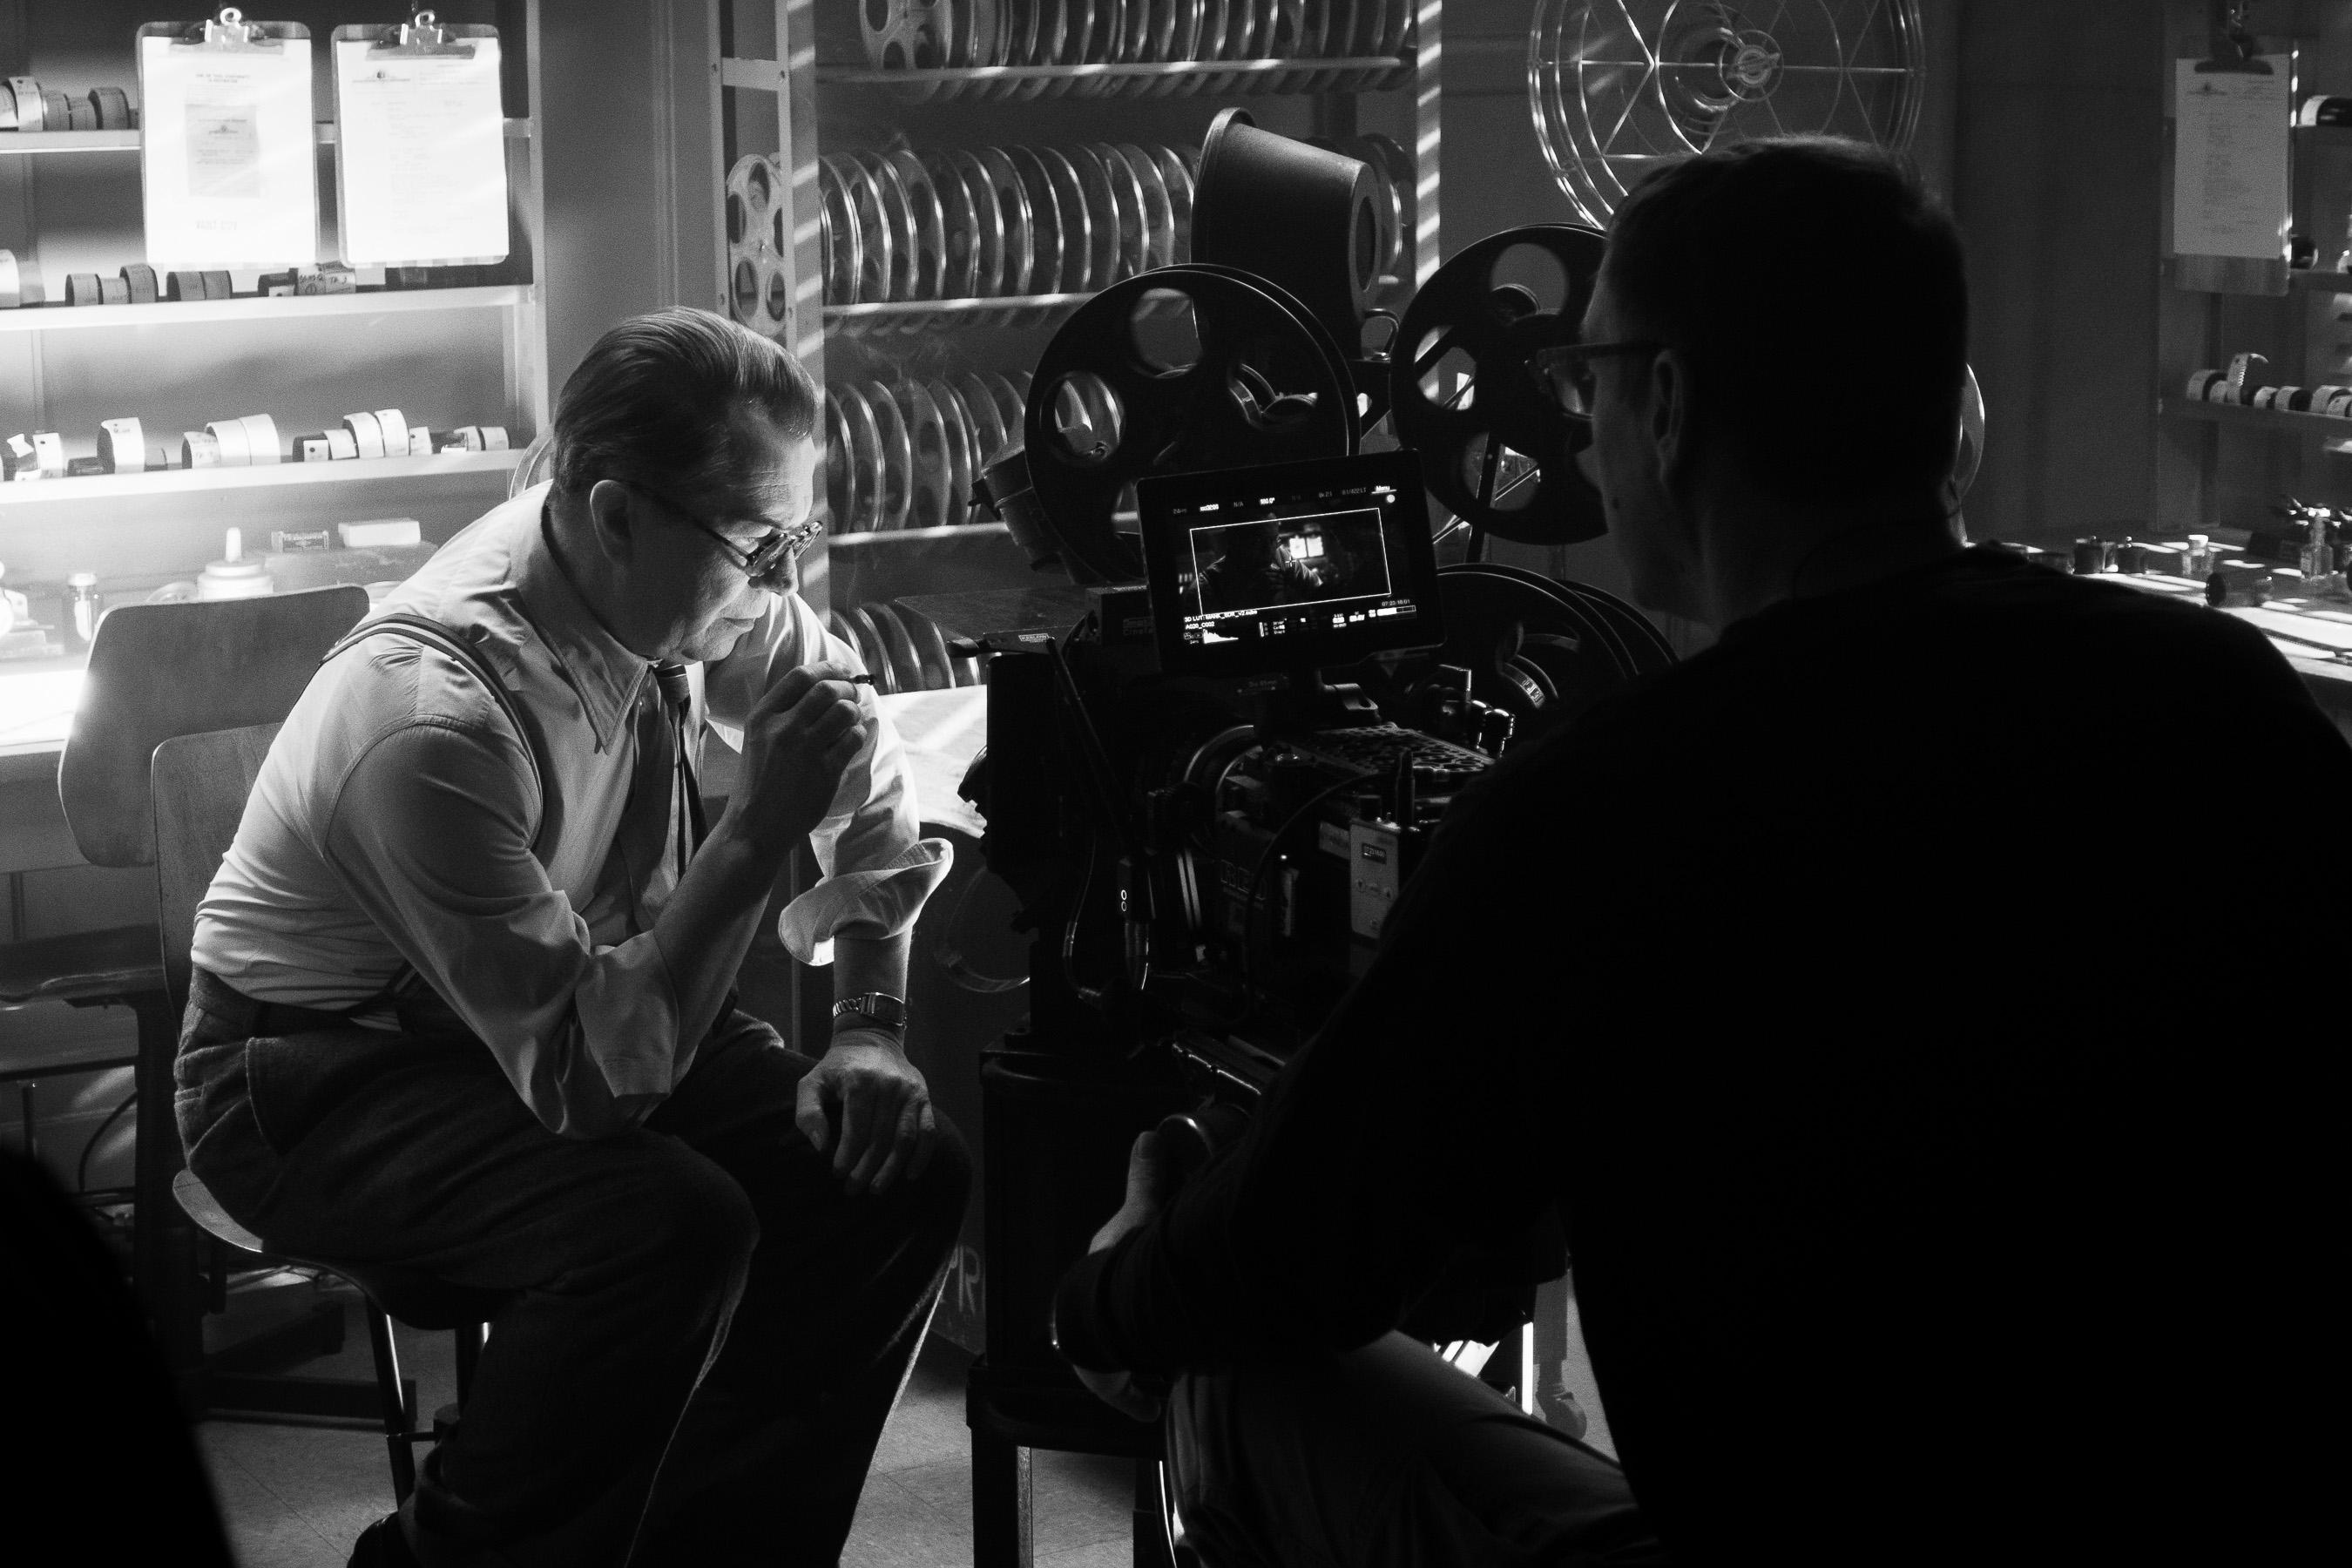 Gary Oldman Stars as 'Citizen Kane' Screenwriter in 'Mank' Trailer